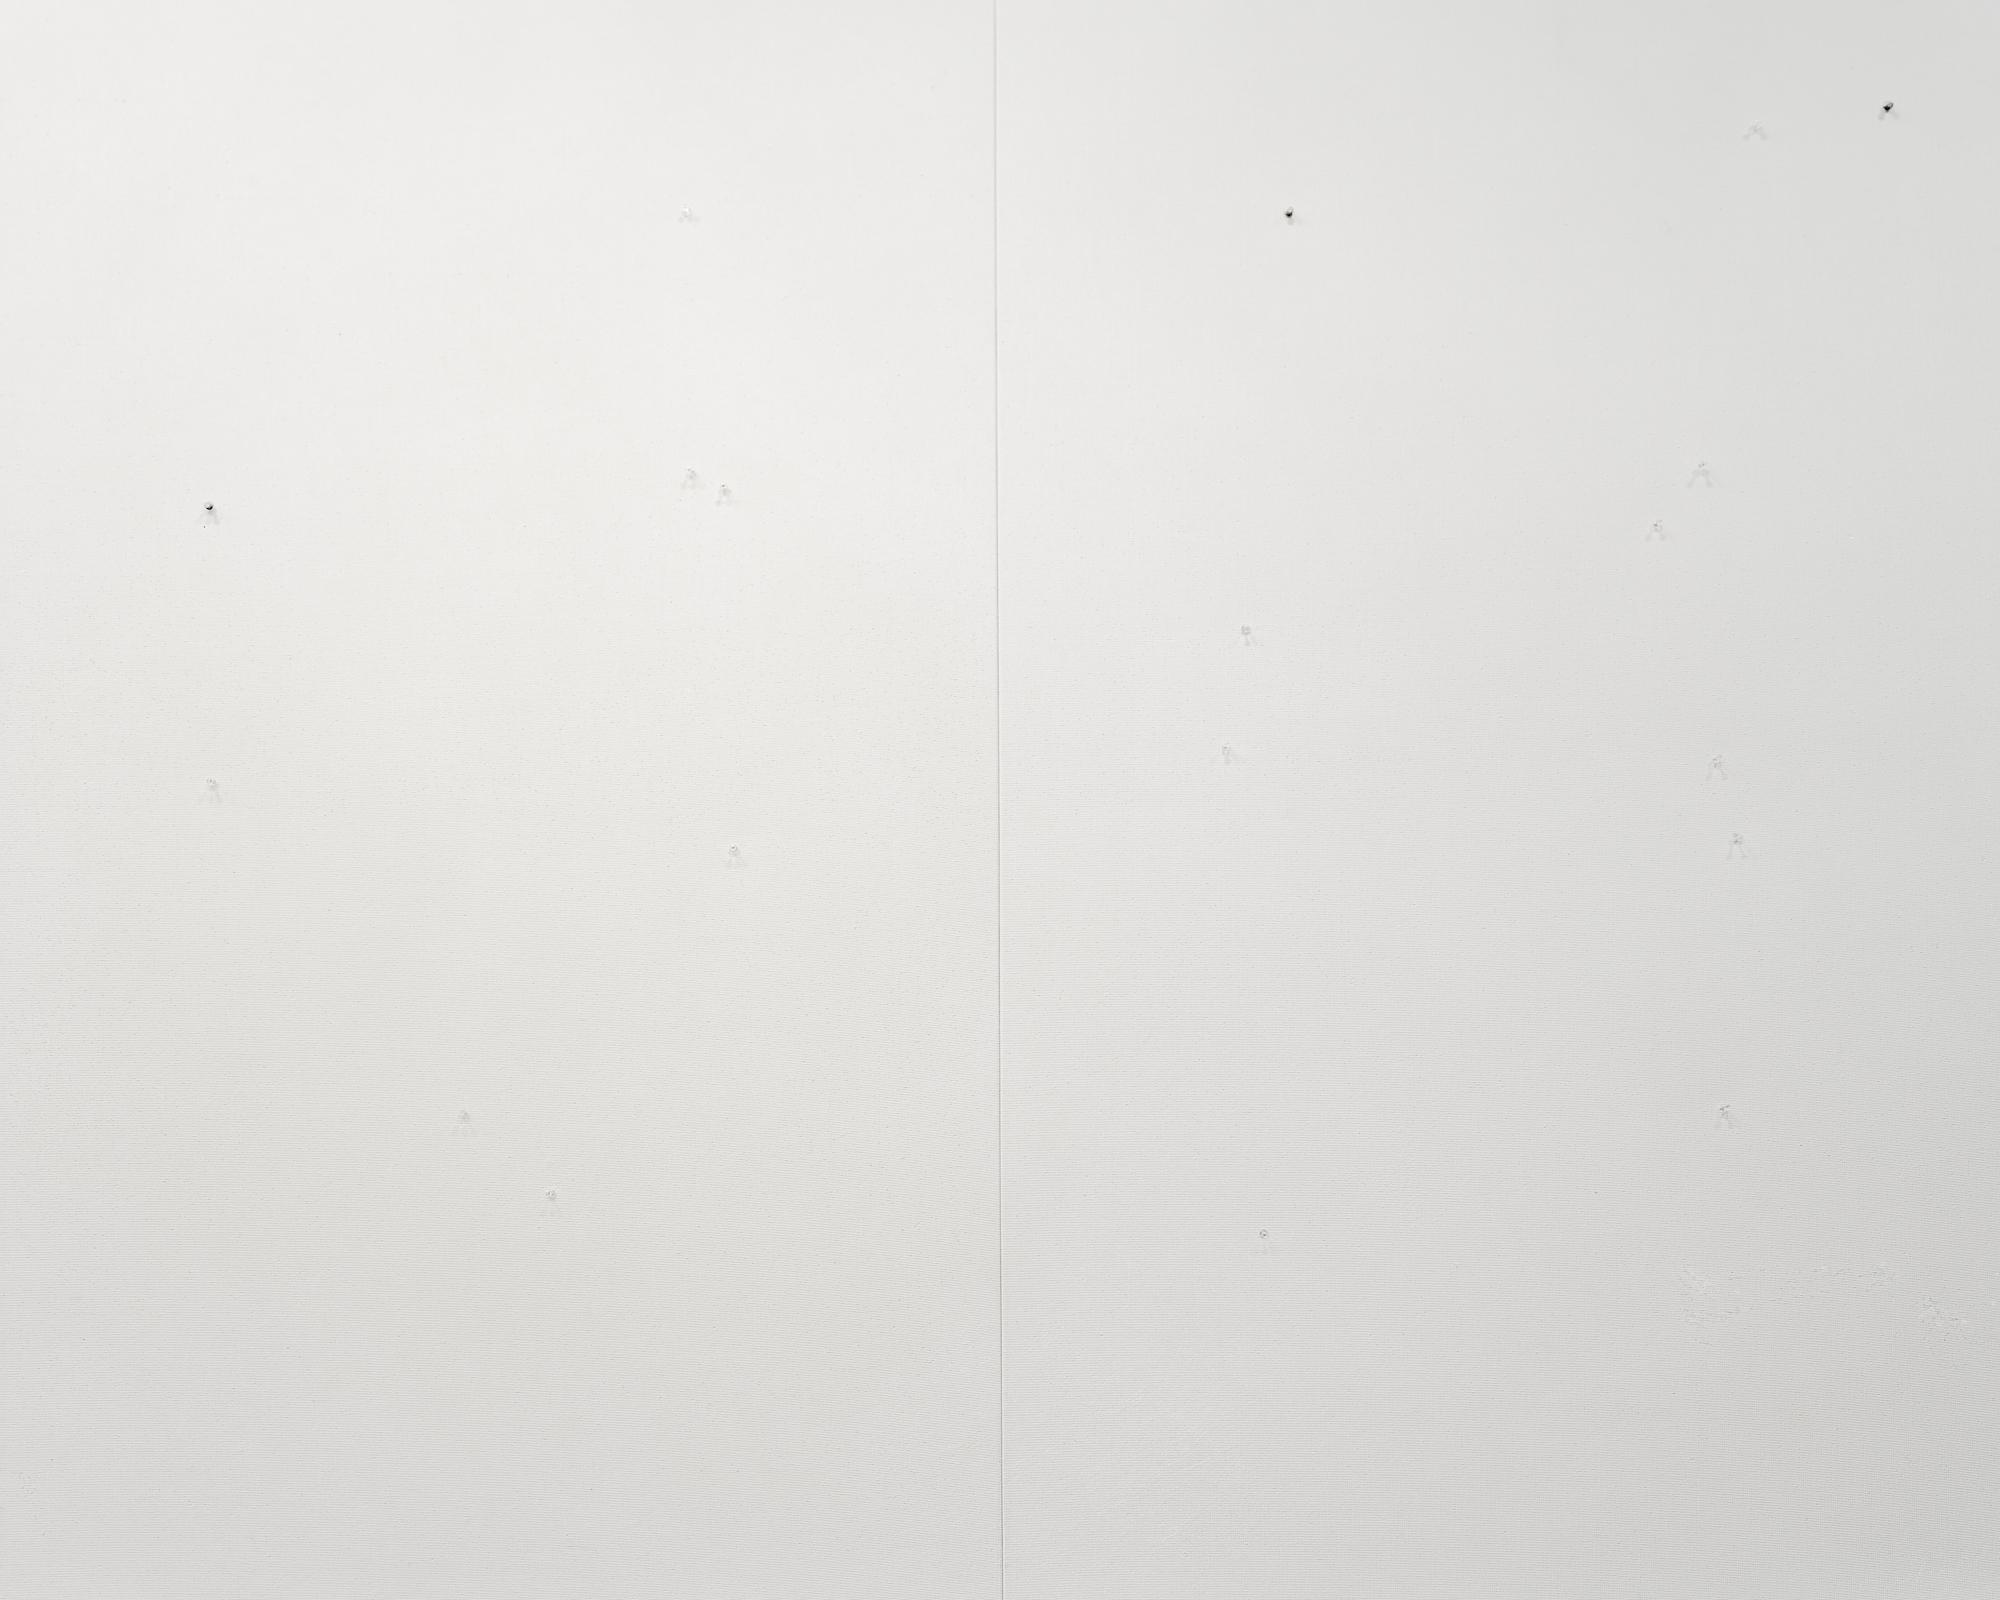 Classroom-1, archival pigment print,11 x 14 inches, 2012